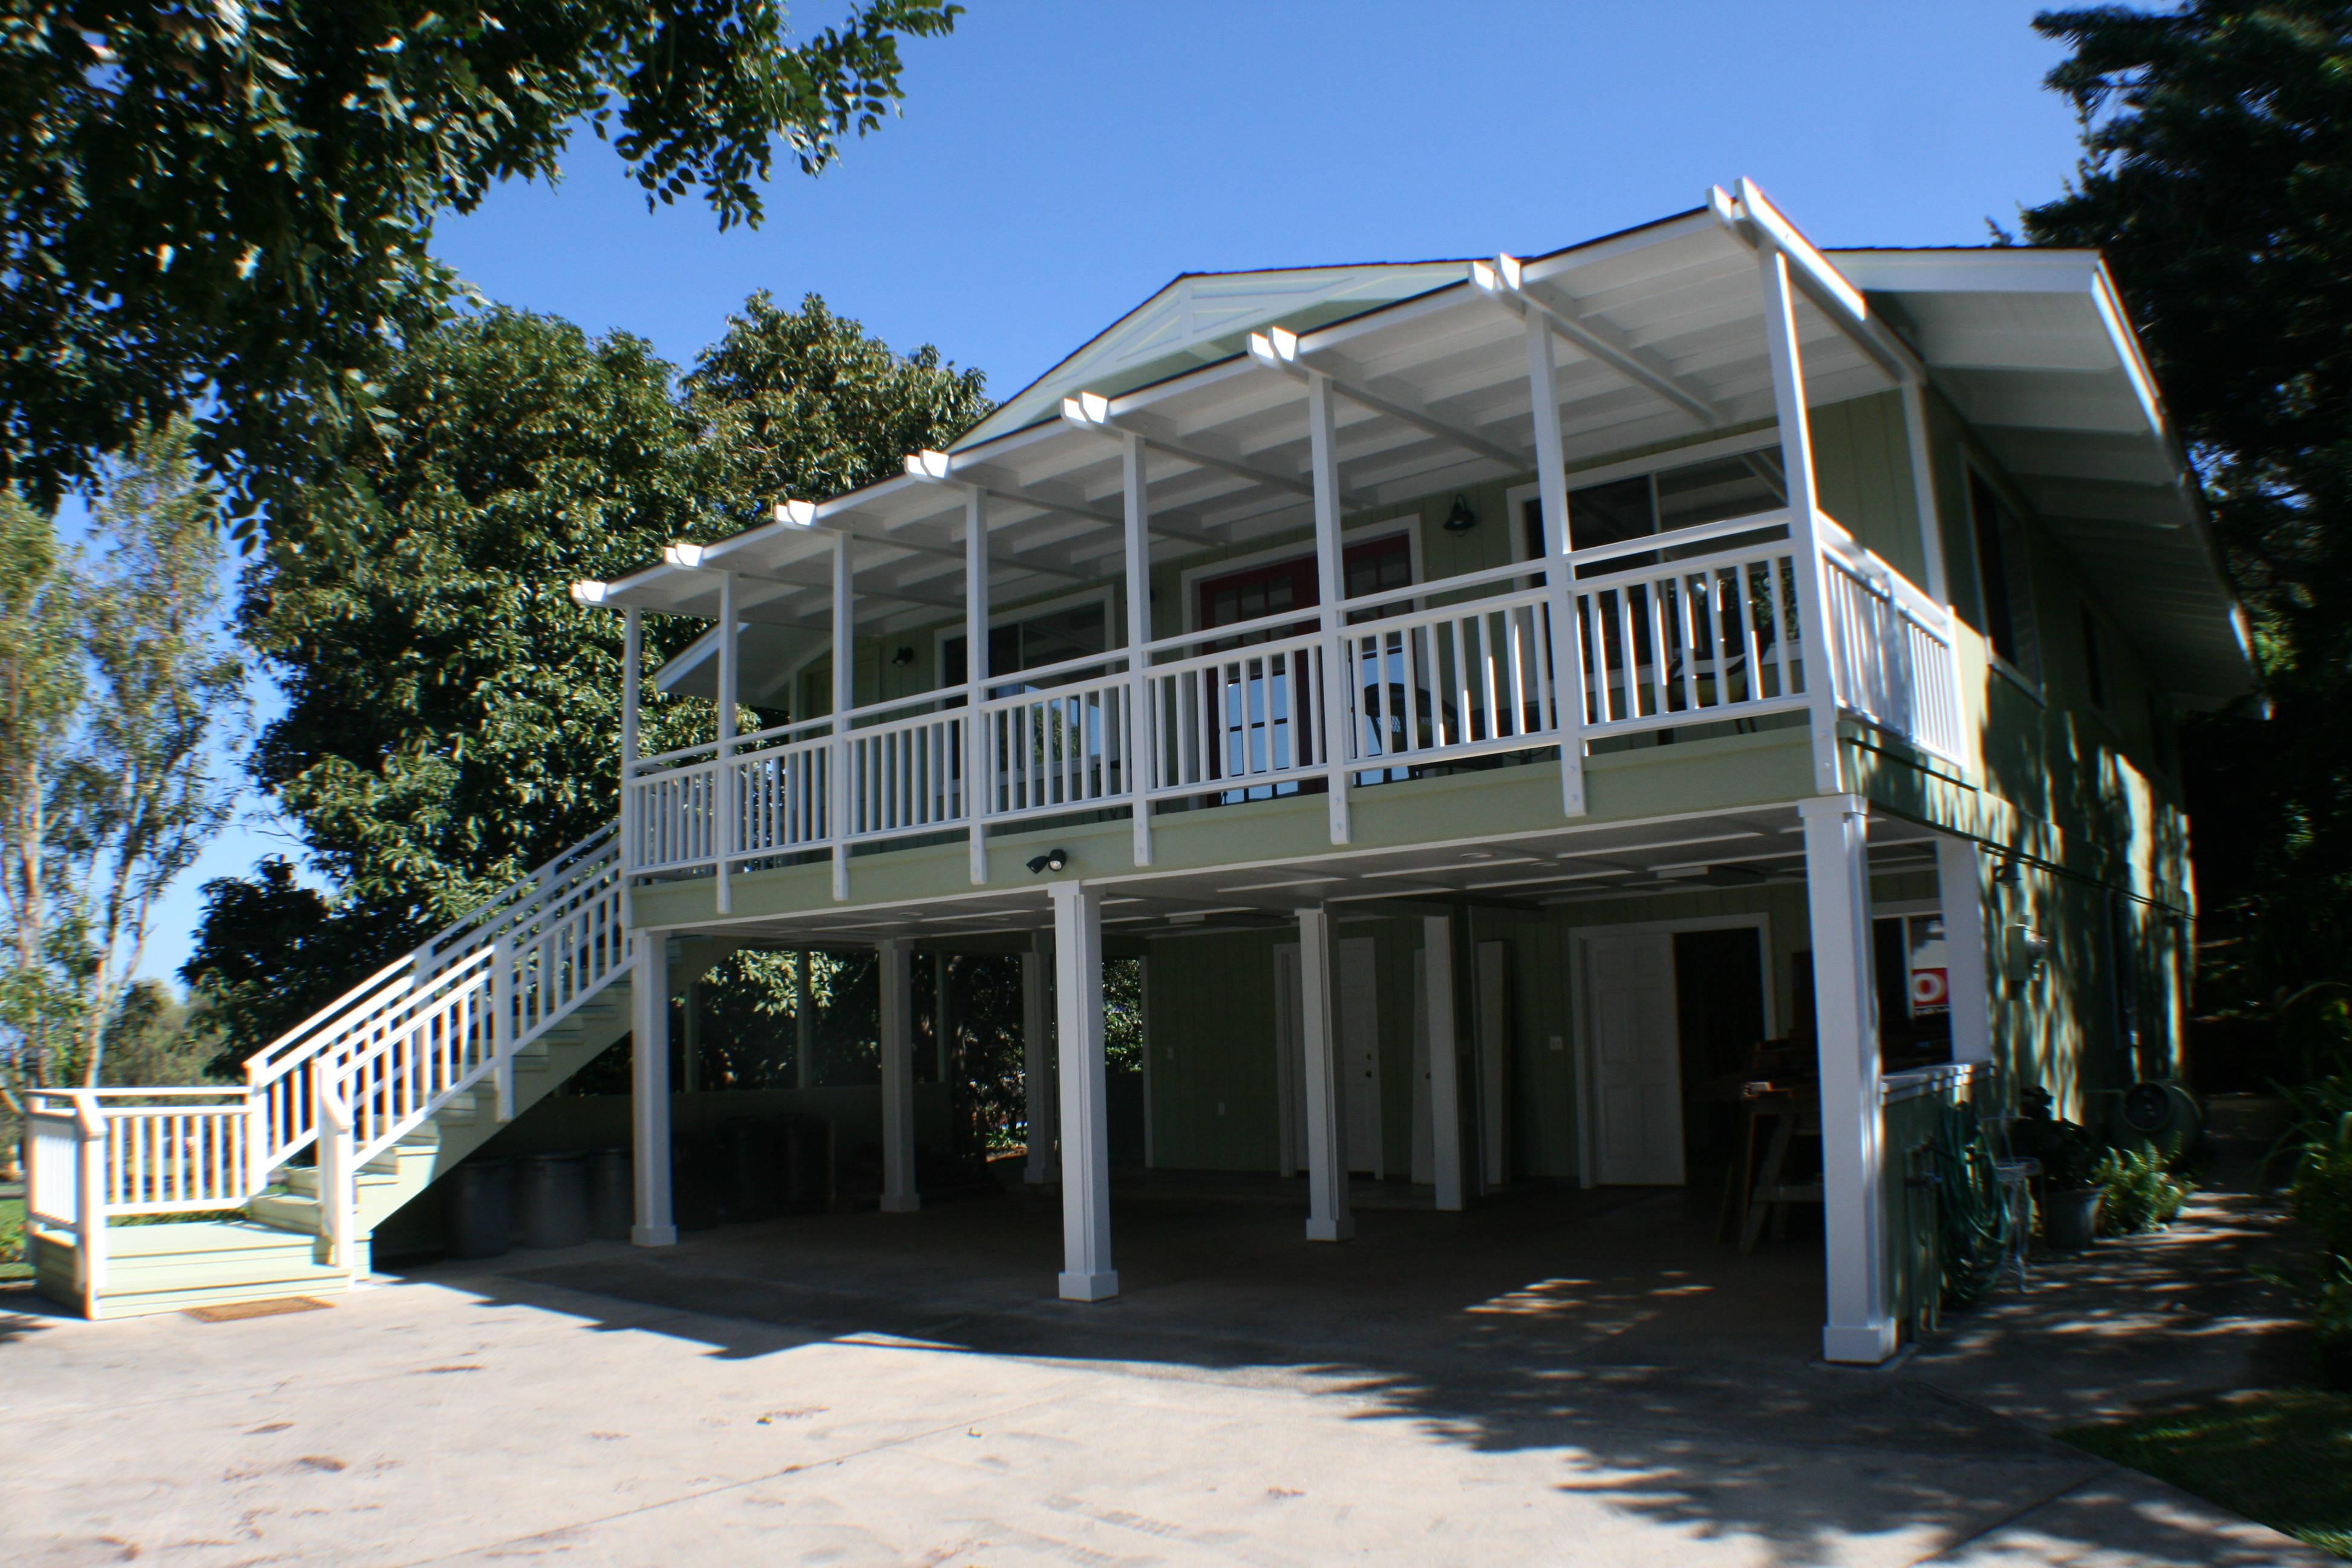 maui uplands house and cottage for sale maui hawaii. Black Bedroom Furniture Sets. Home Design Ideas